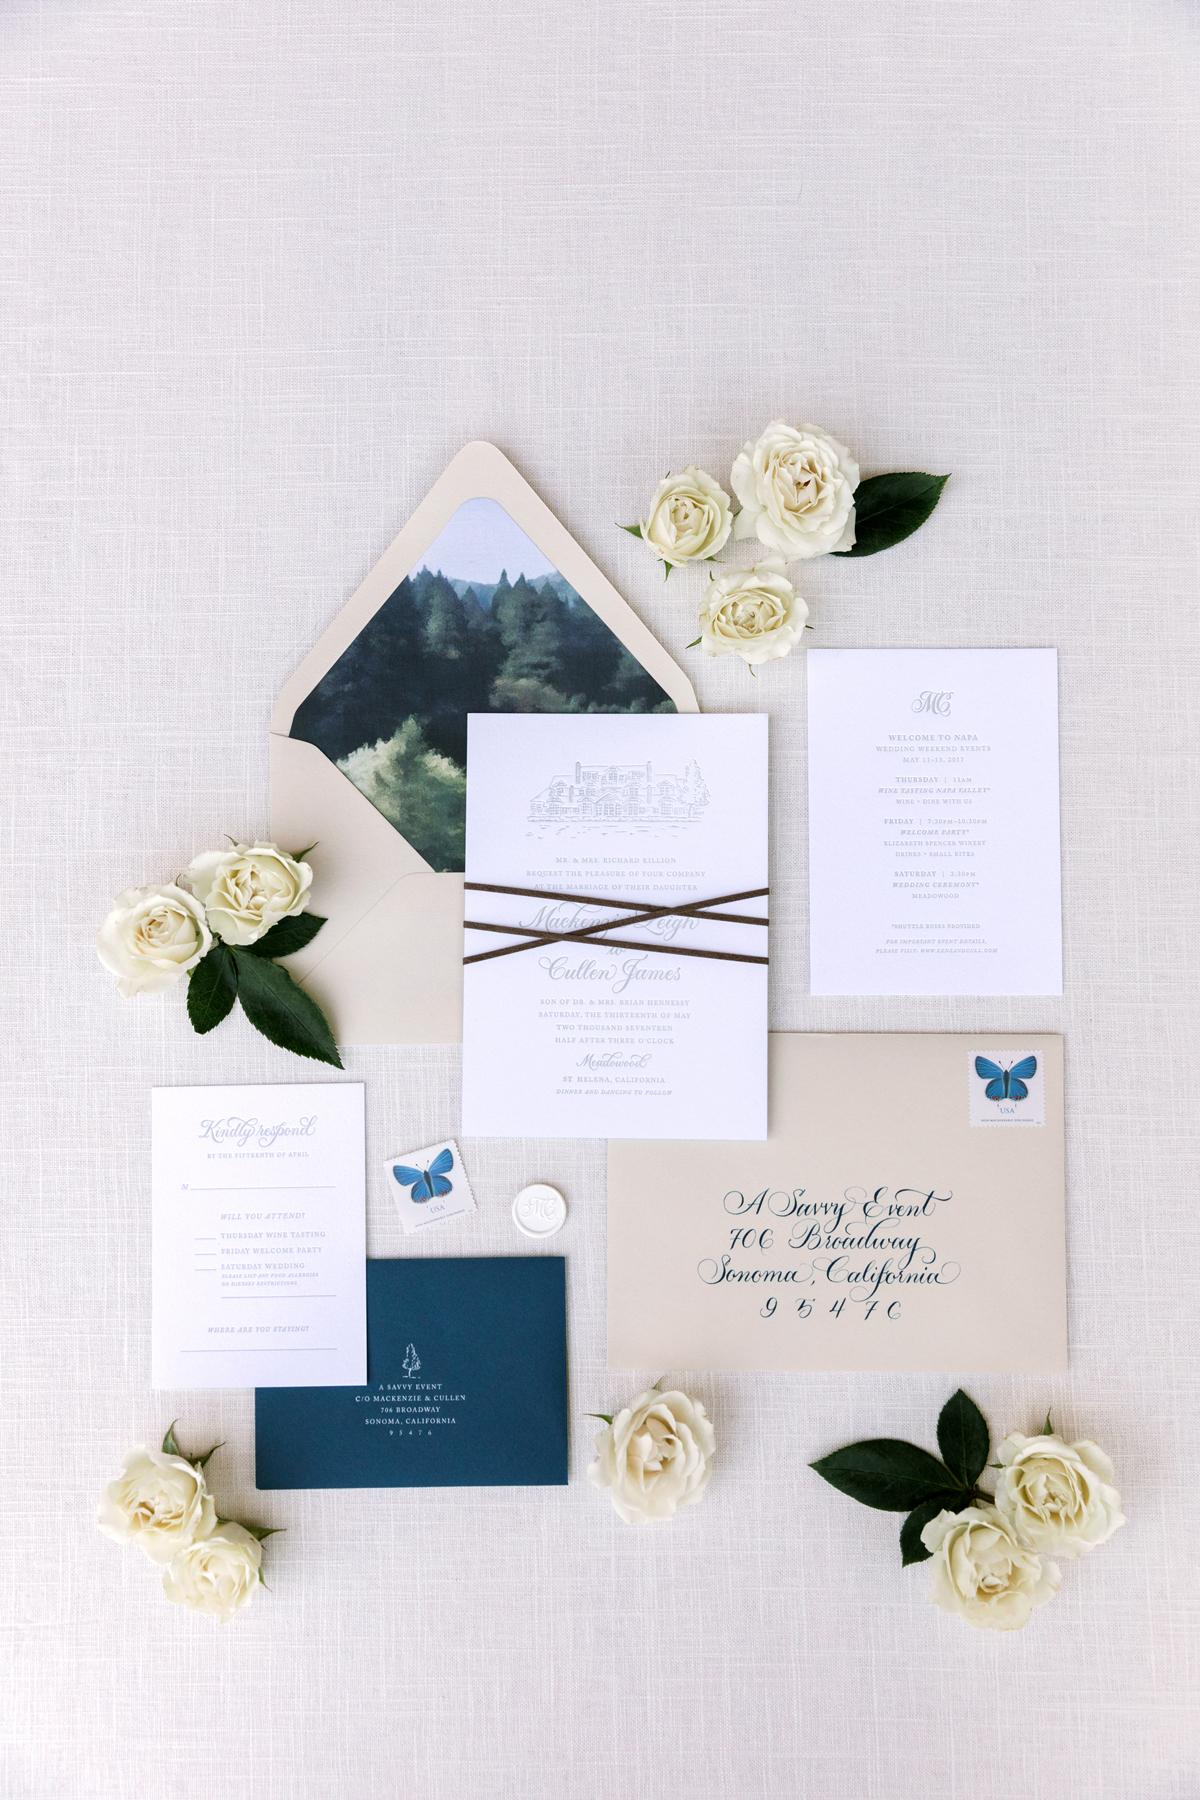 envelope invites the edges